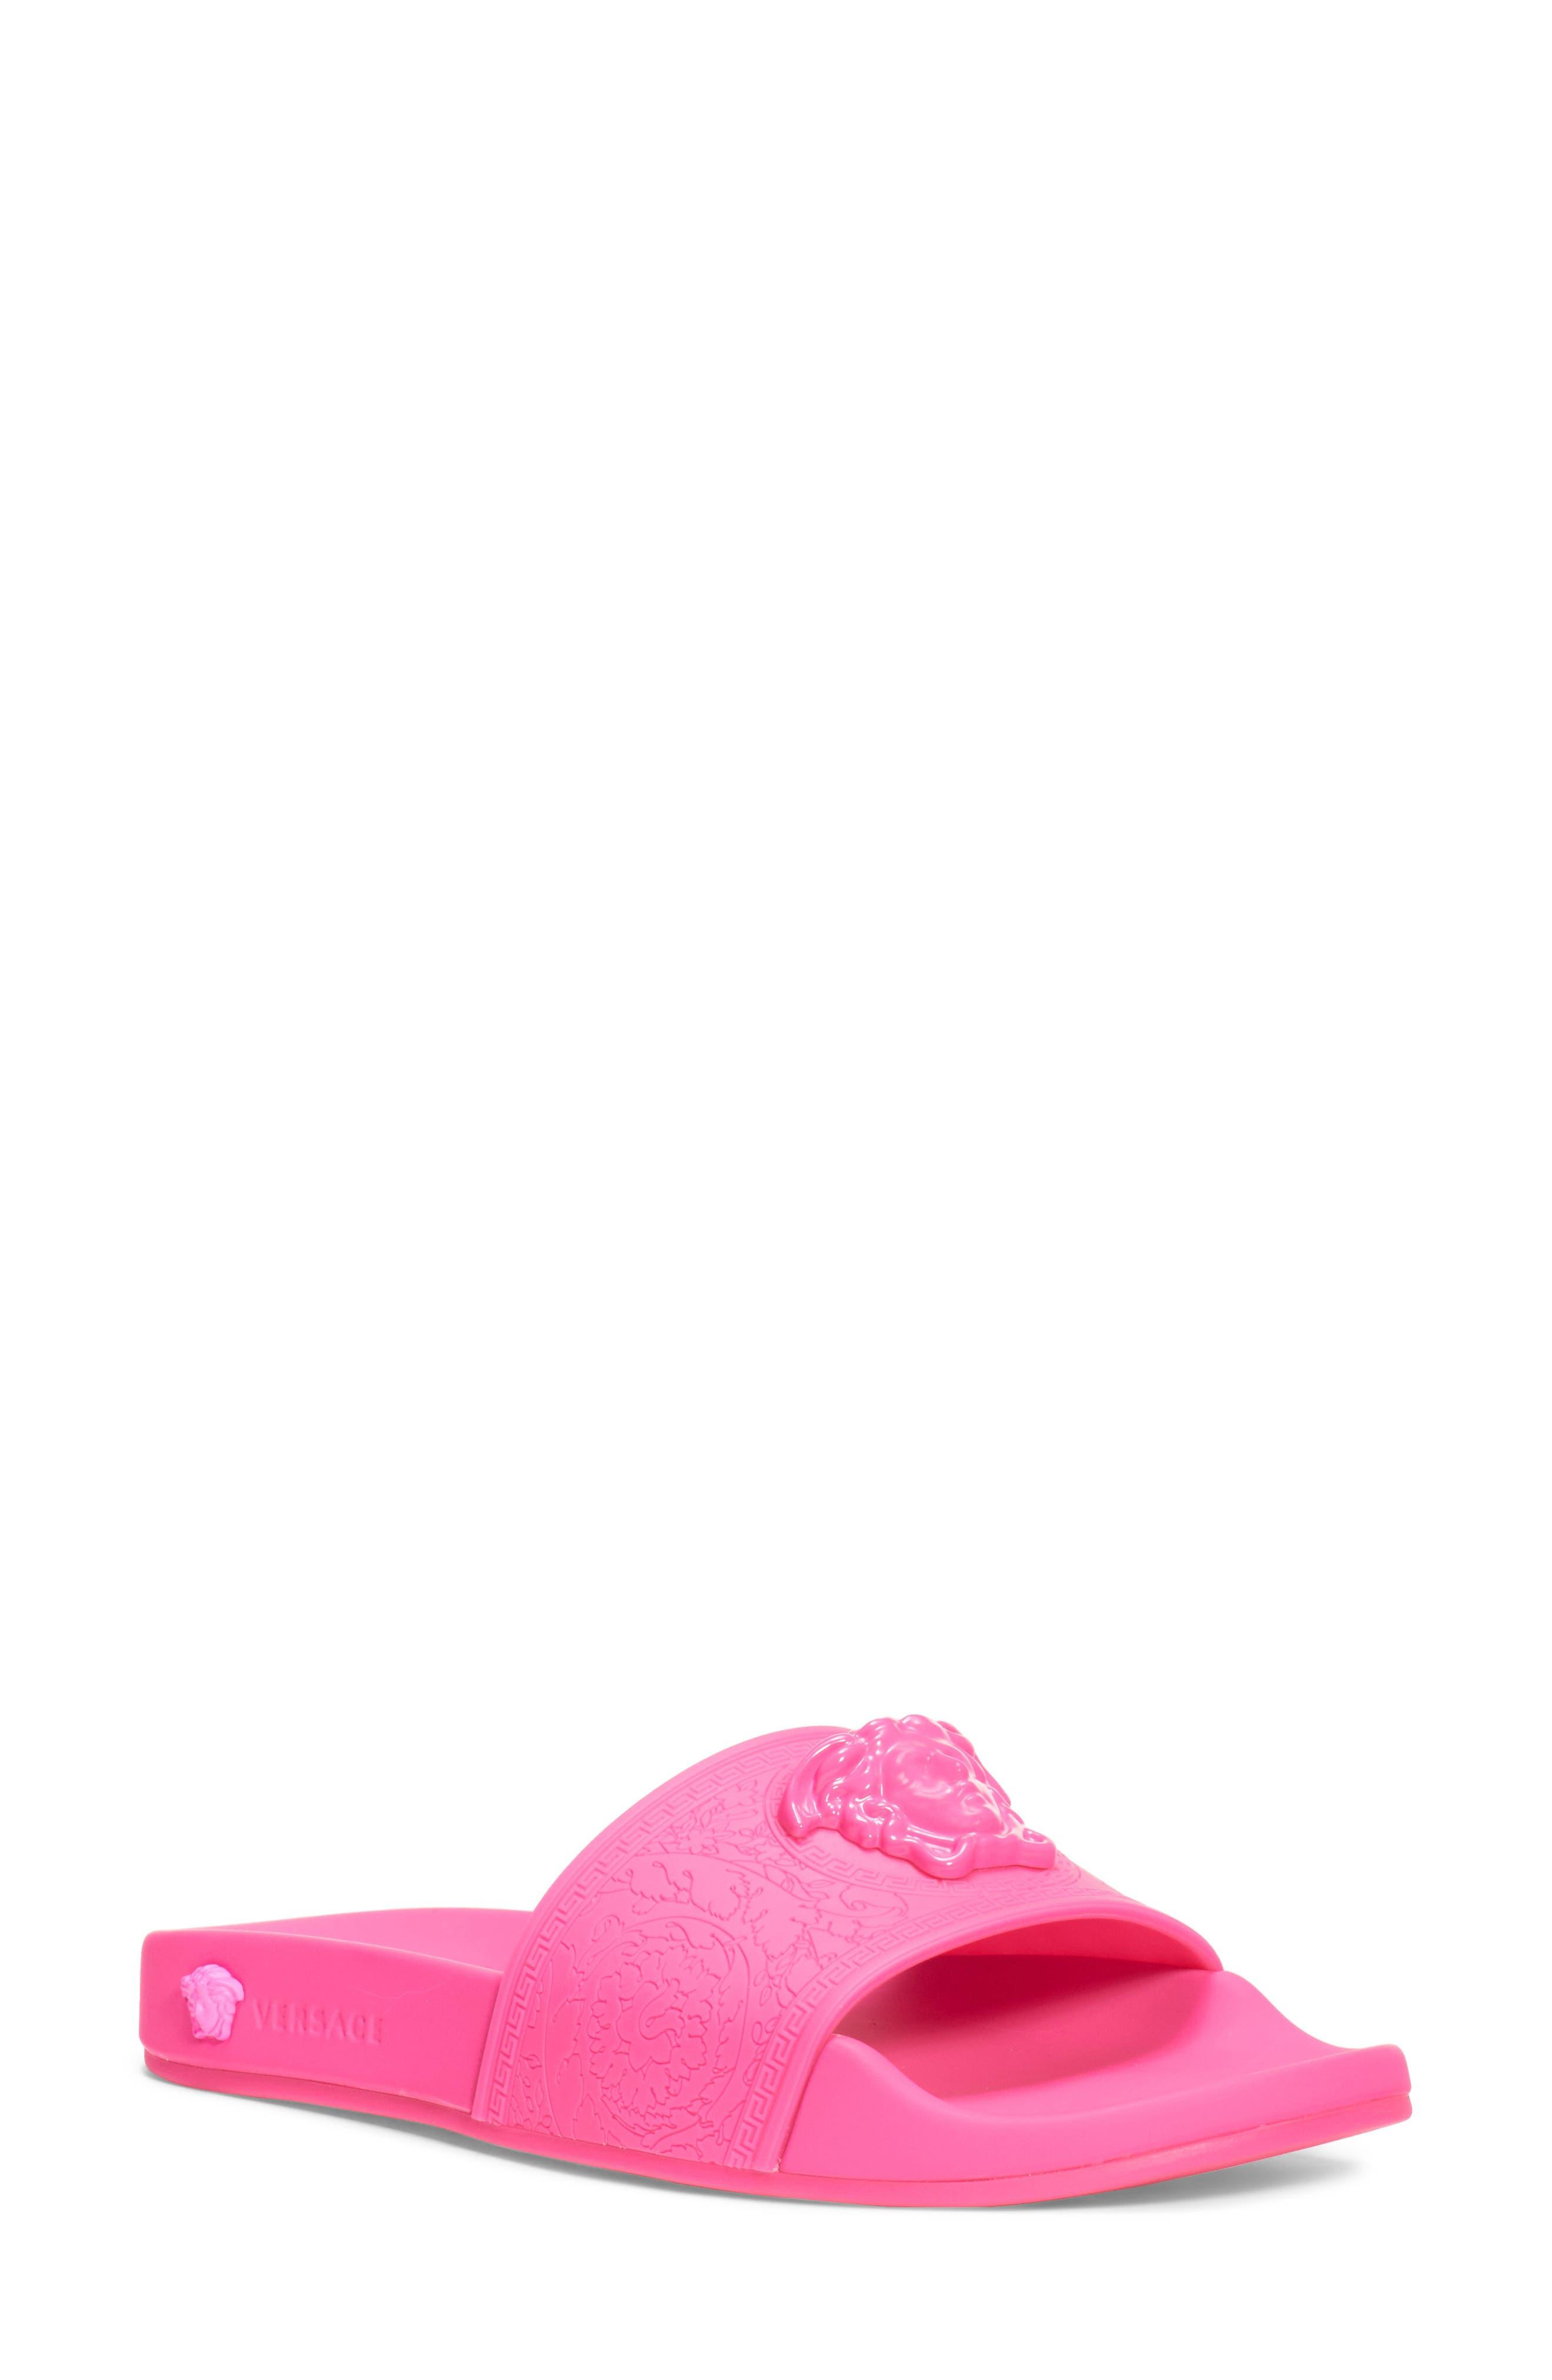 Versace Slippers Medusa Palazzo Slide Sandal